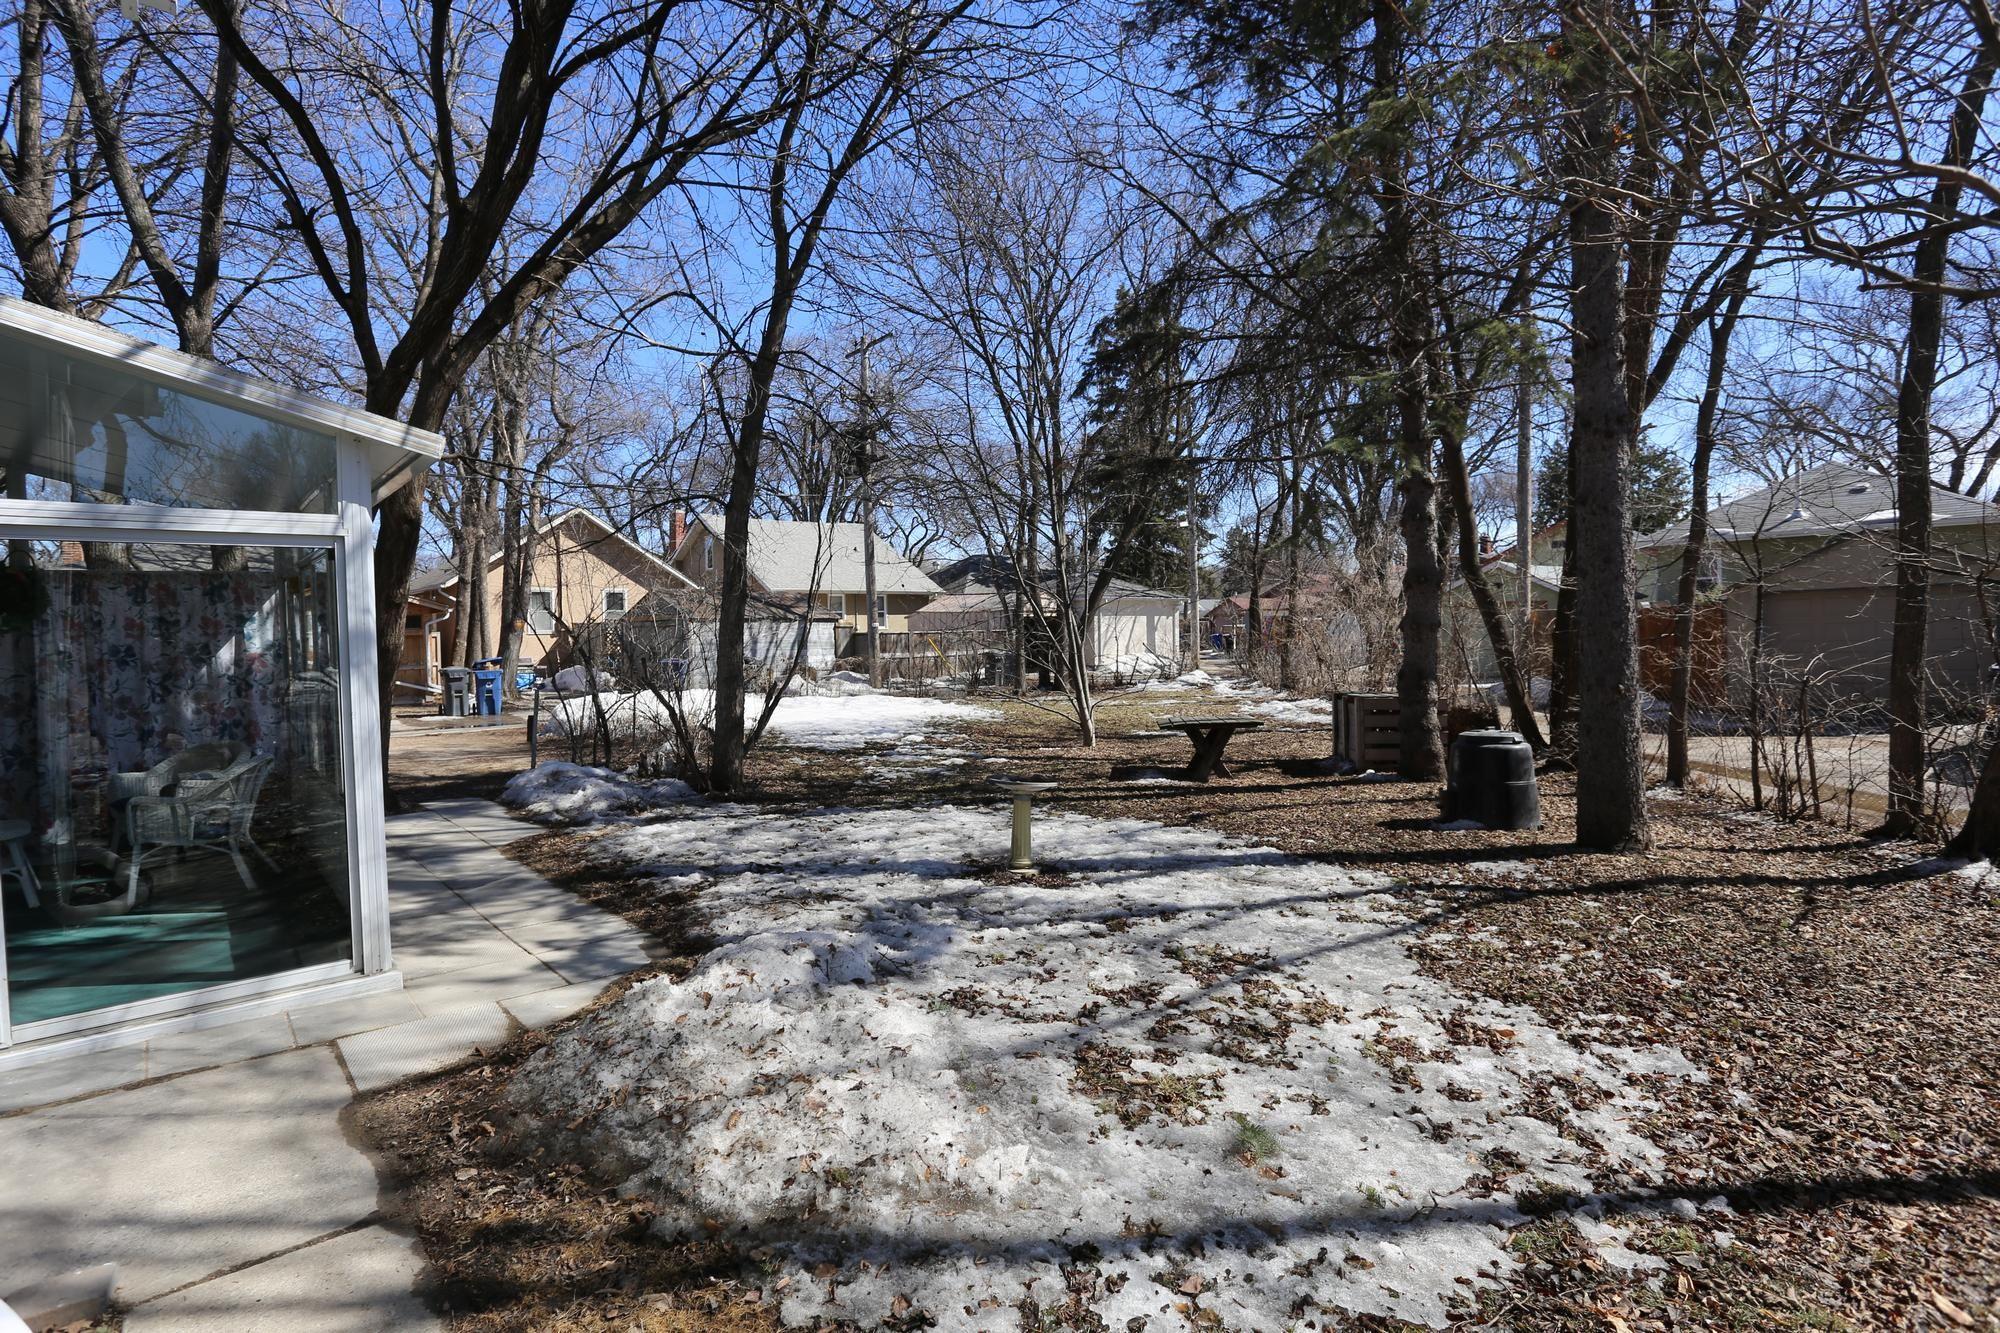 Photo 4: Photos: 109 Garfield Street South in Winnipeg: Wolseley Single Family Detached for sale (5B)  : MLS®# 1808340